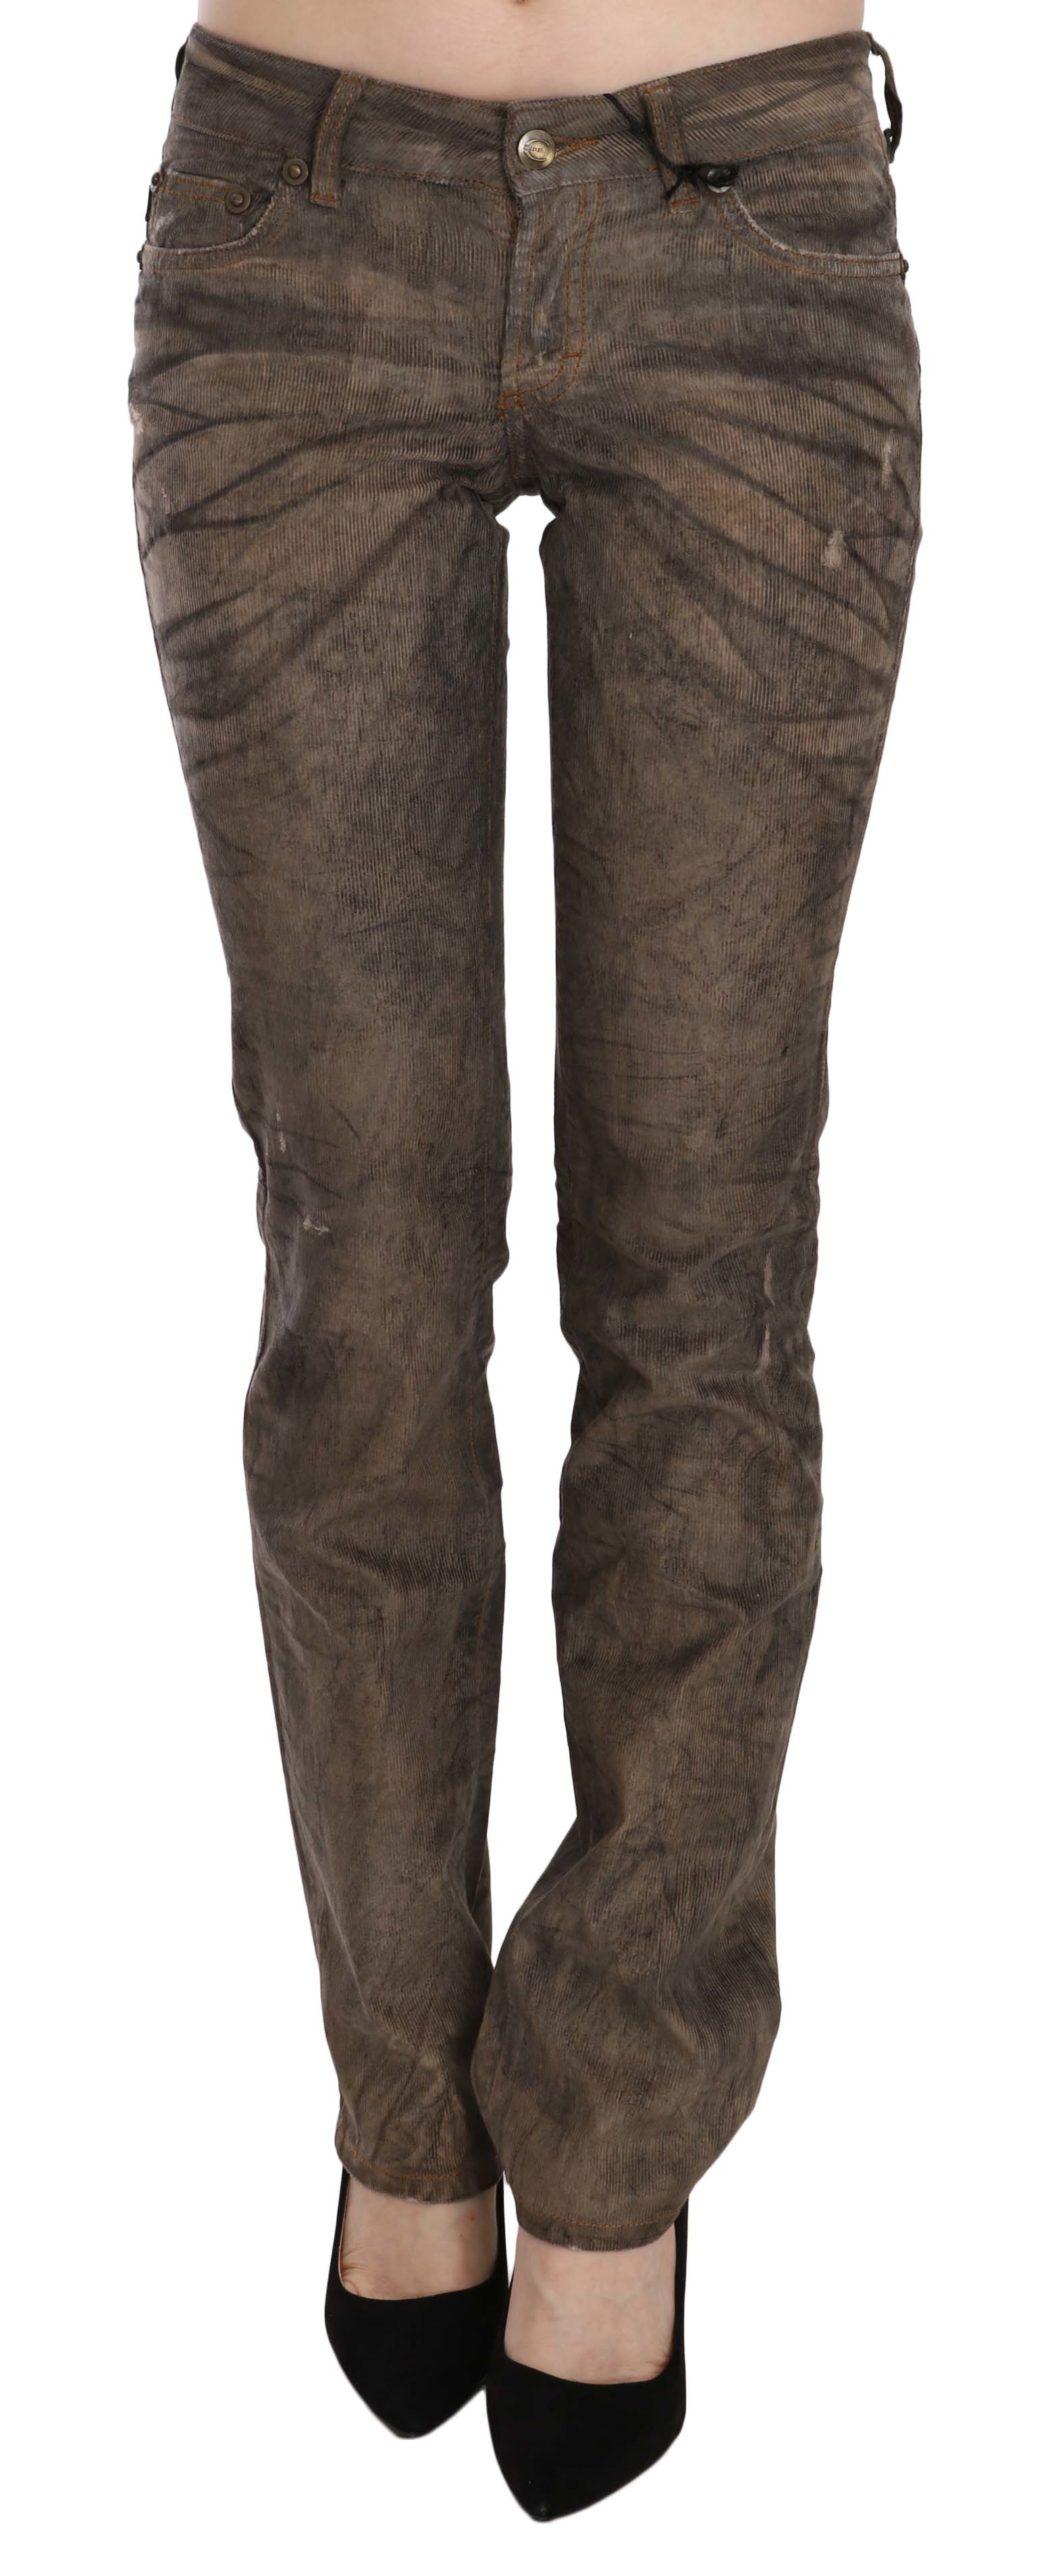 Just Cavalli Women's Low Waist Skinny Denim Trouser Black PAN70330 - W26